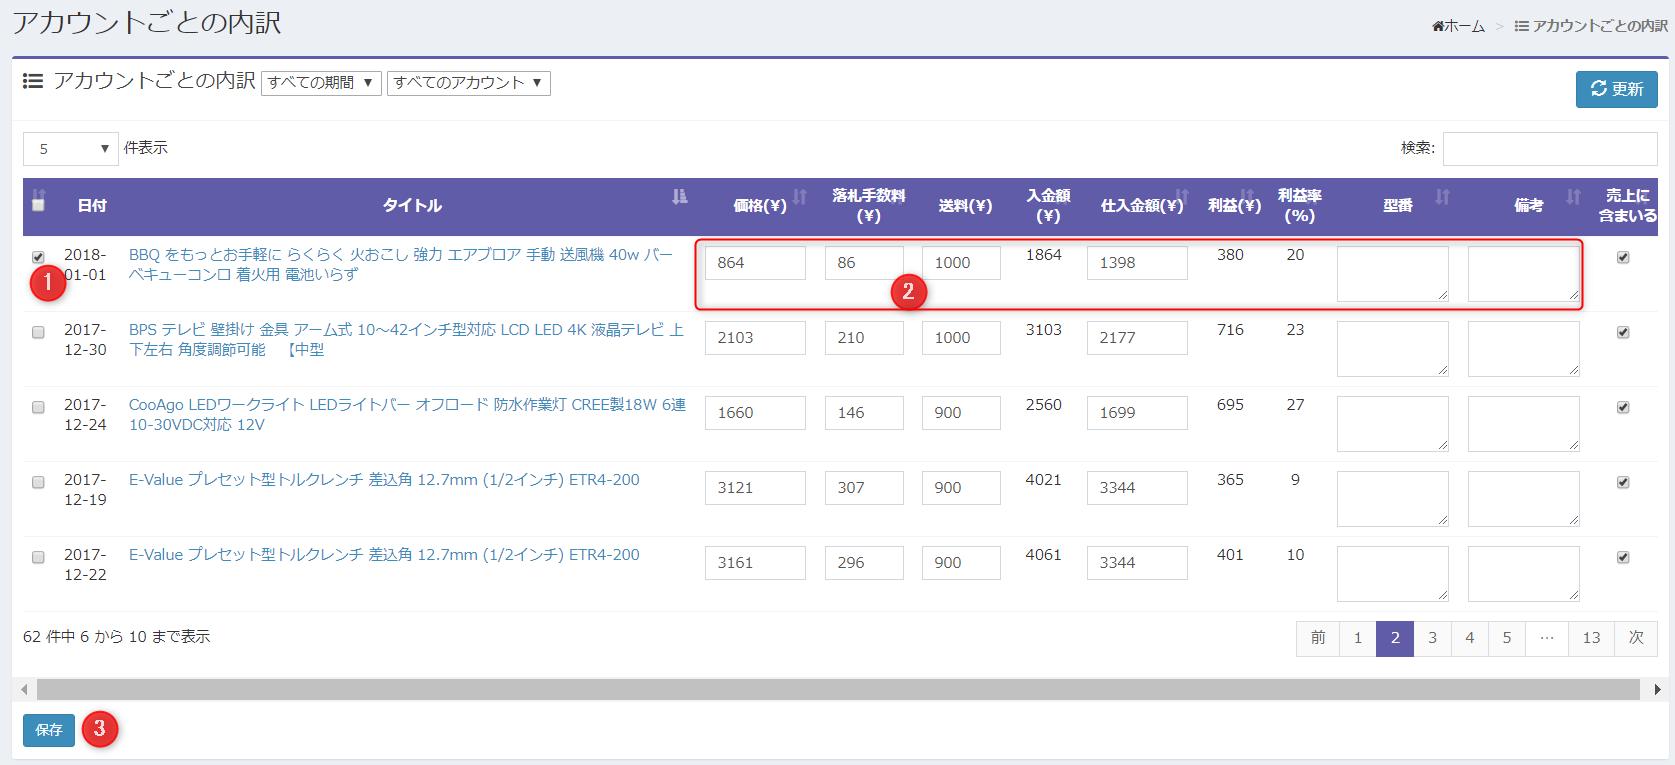 2018 01 04 17h25 58 【TOOL】第六章 利益管理